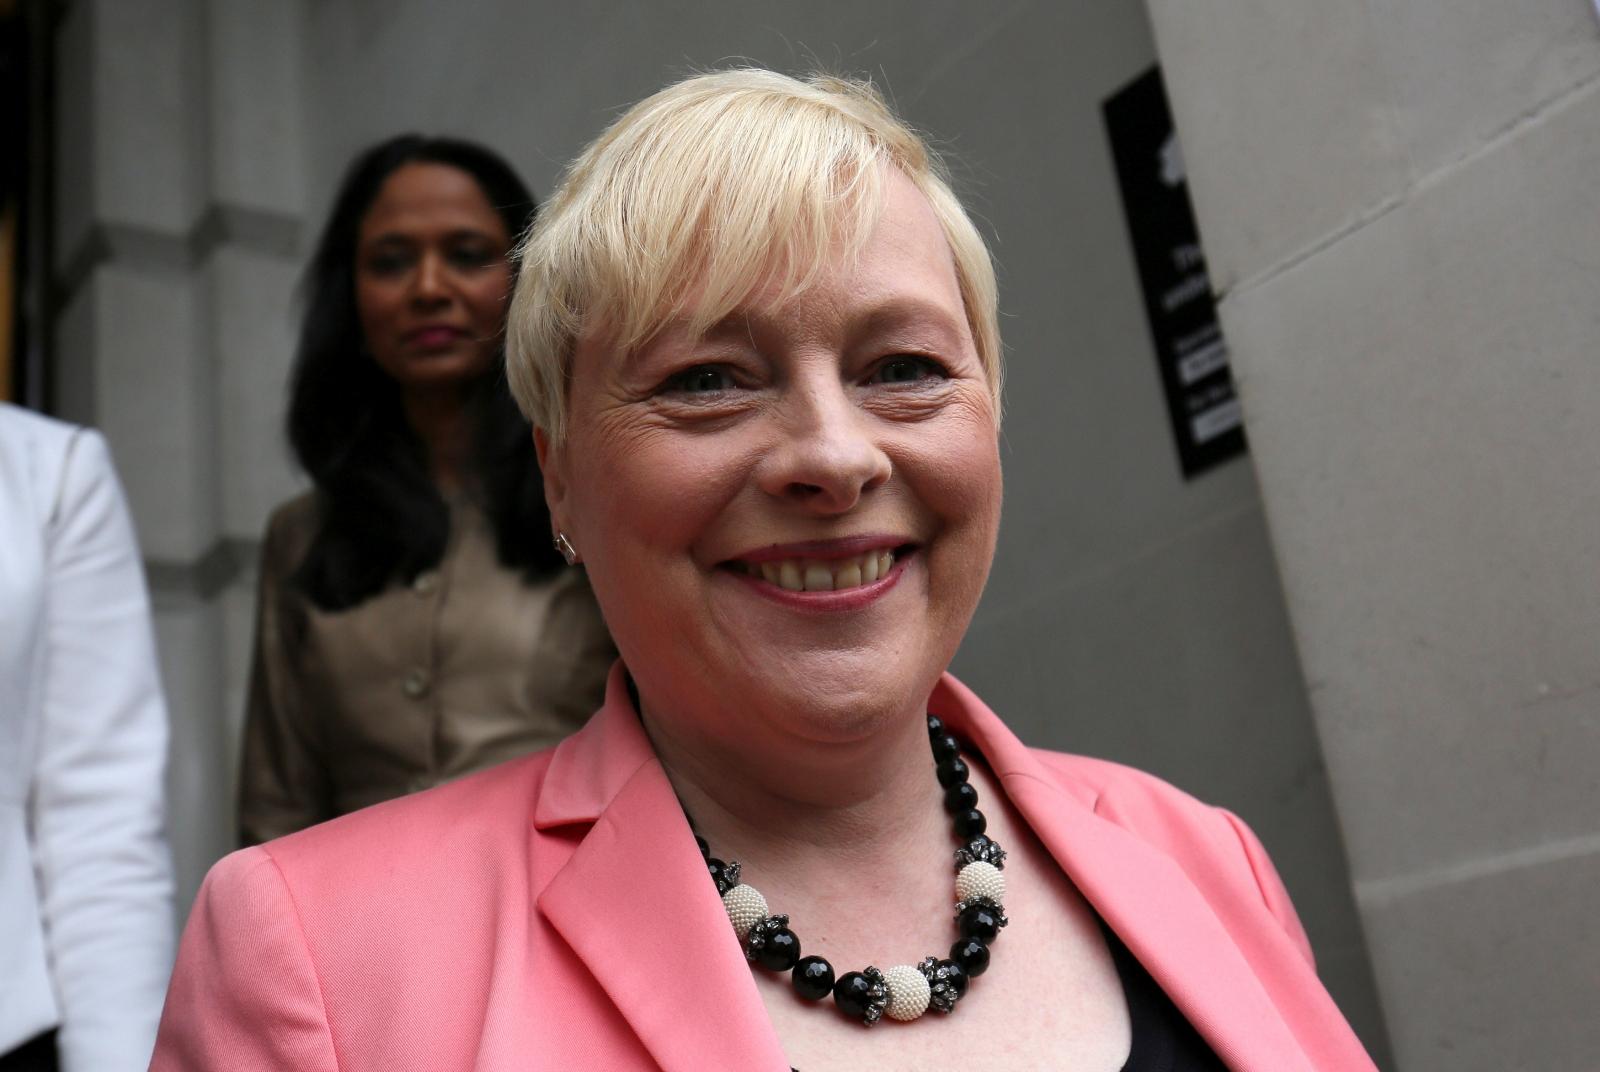 Angela Eagle launches leadership bid